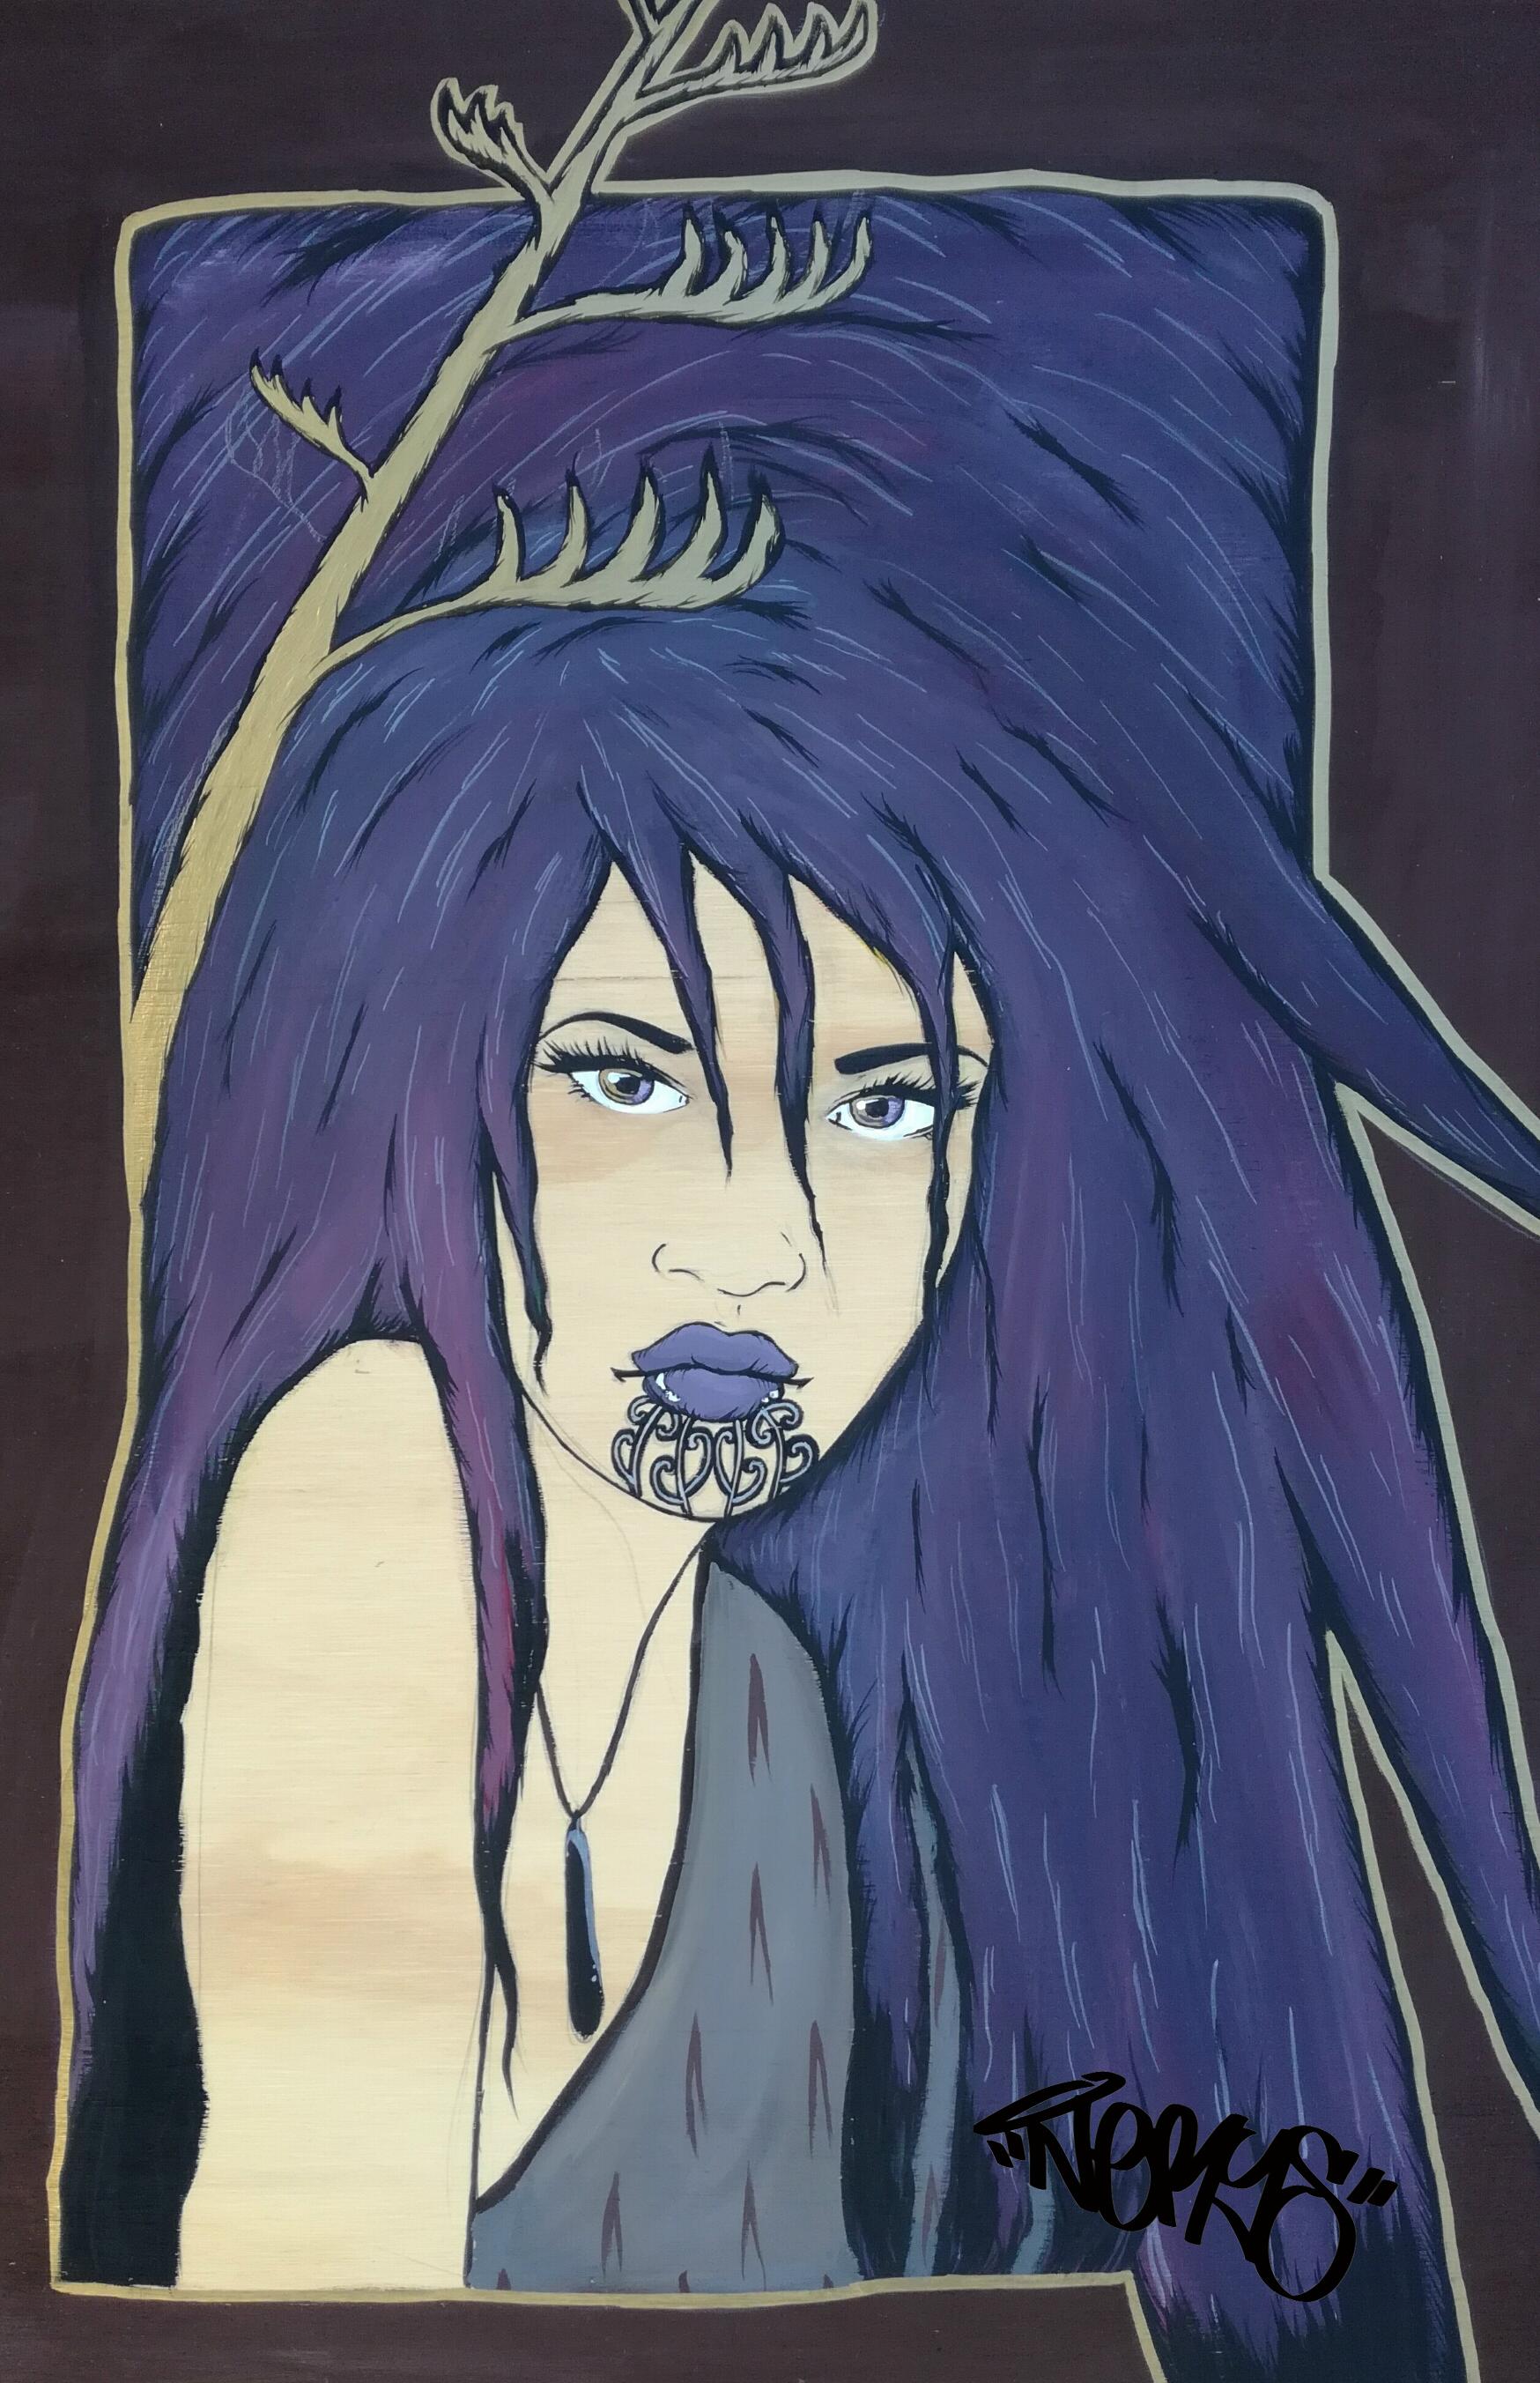 'Whakawai, will o' the wisp' by Nerys Baker.